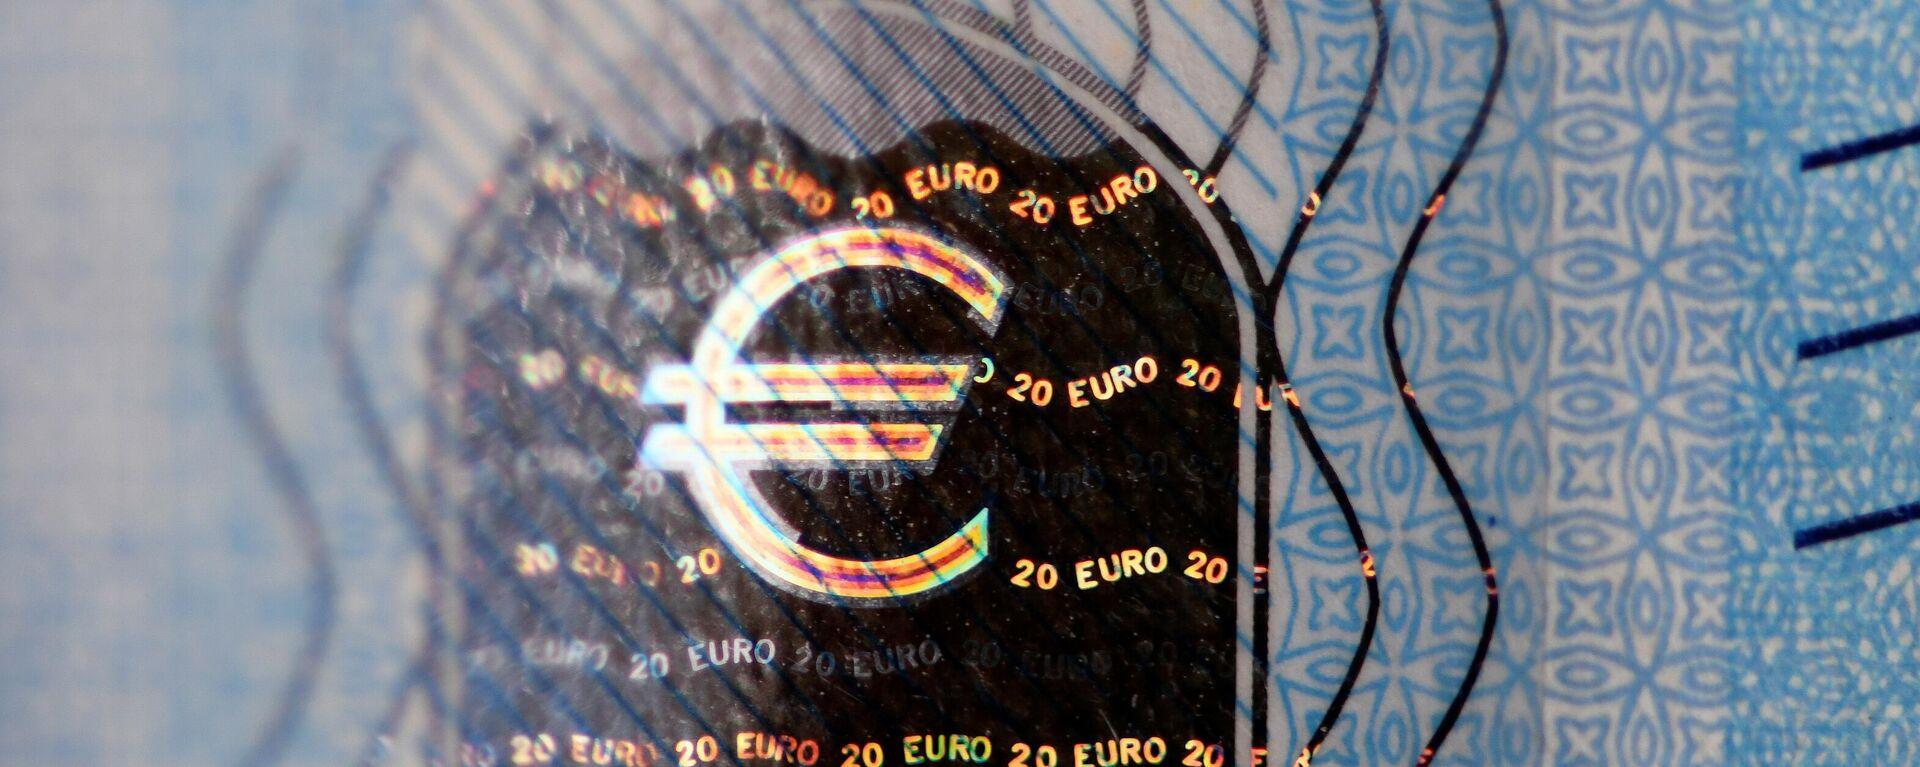 Euro (Symbolbild) - SNA, 1920, 06.01.2021